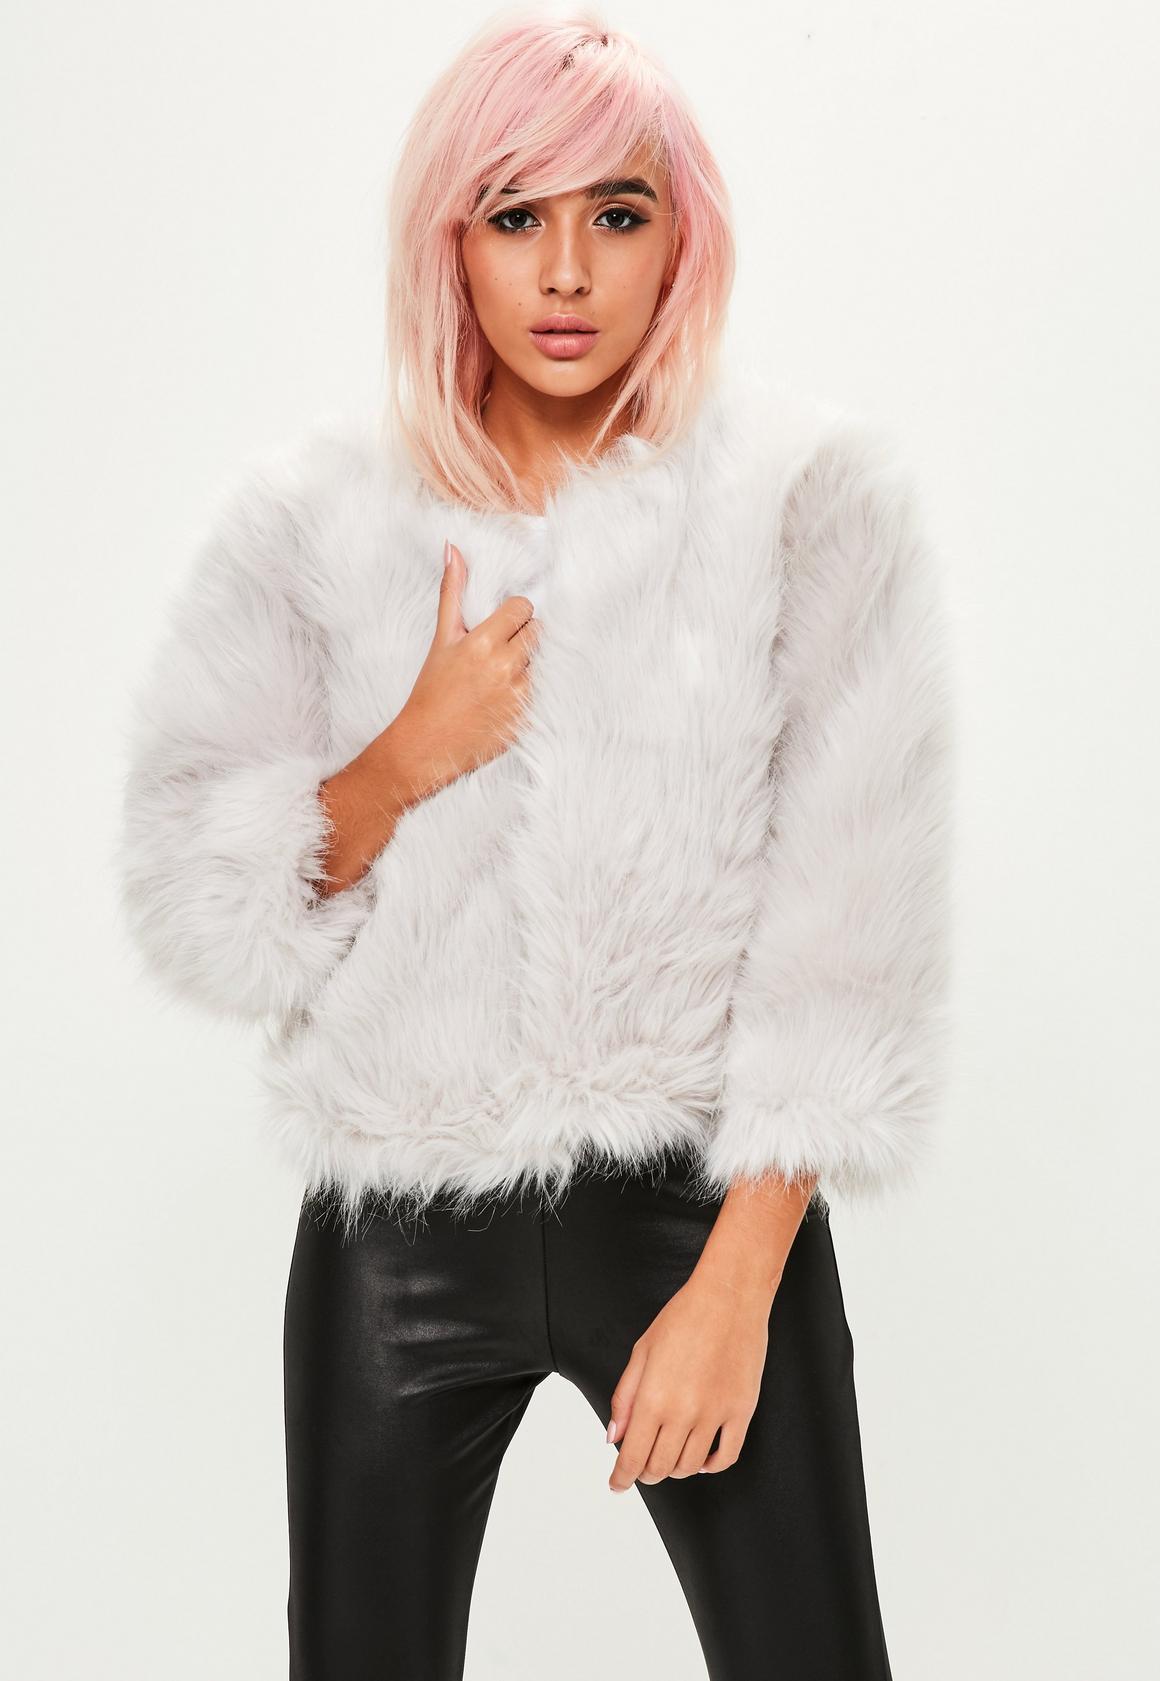 Grey Fluffy Faux Fur Short Jacket | Missguided Ireland